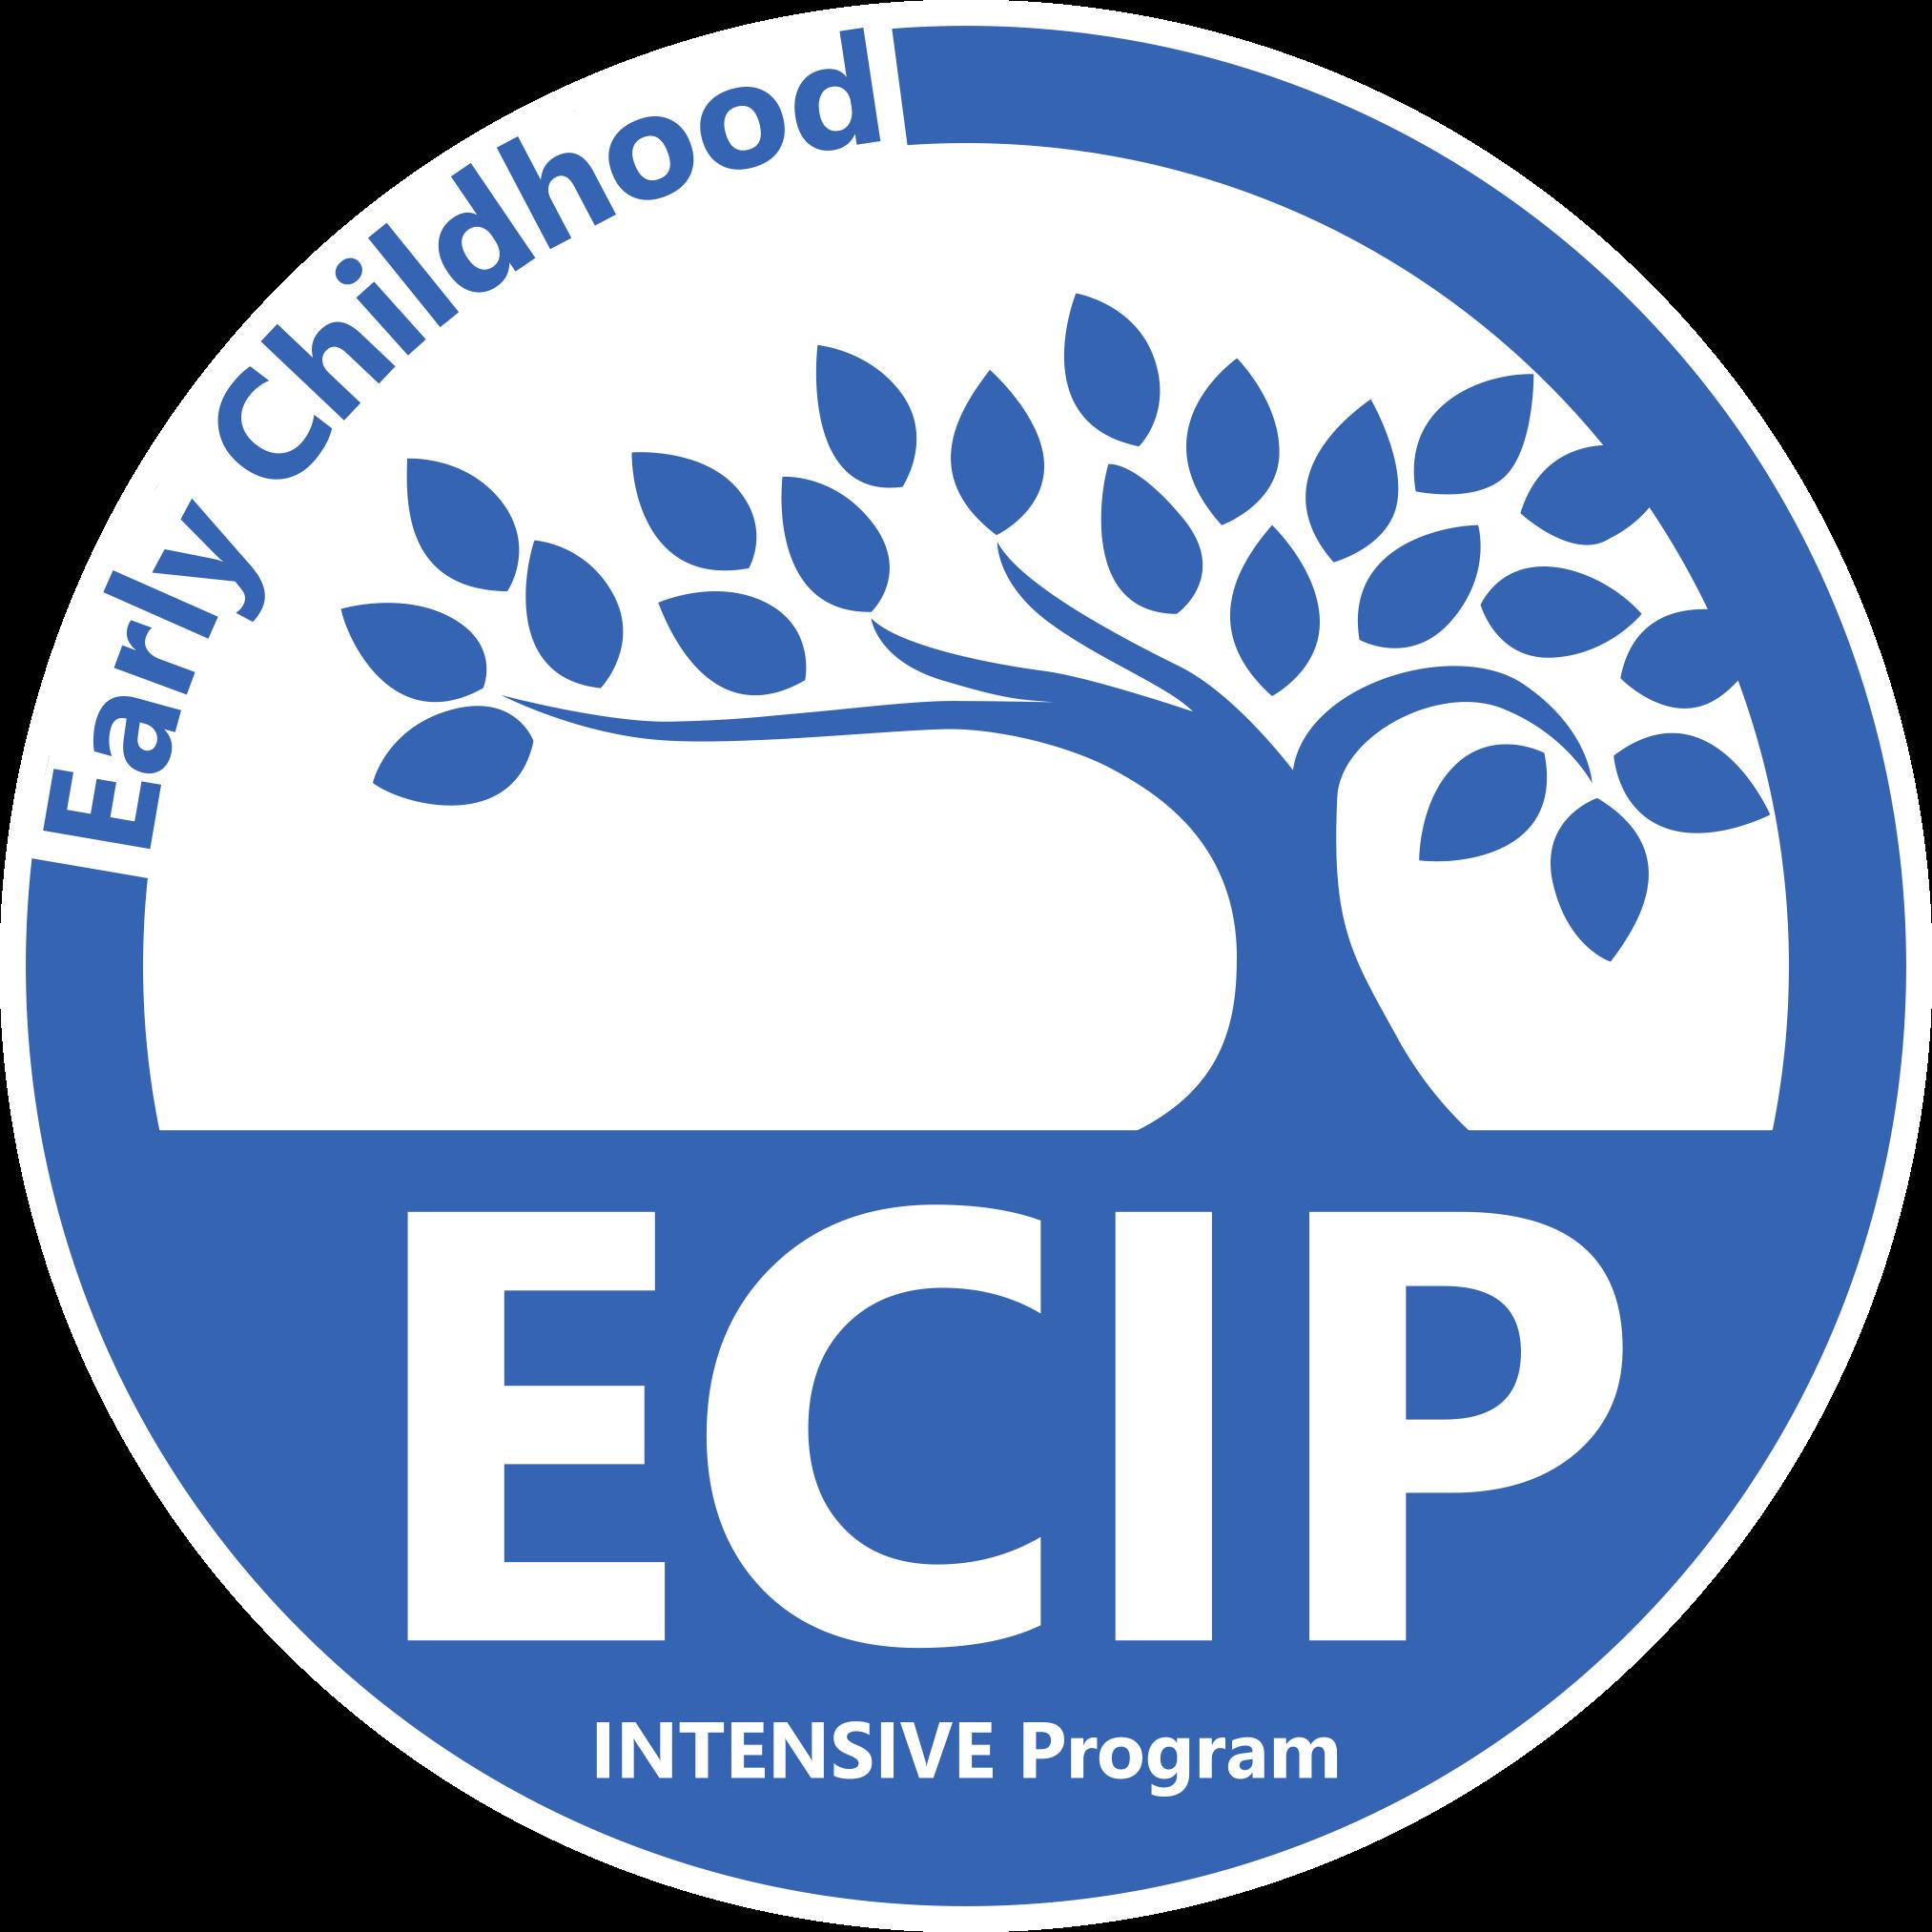 http://ecipkids.com.au/wp-content/uploads/2017/10/cropped-ecip-logo-1.png